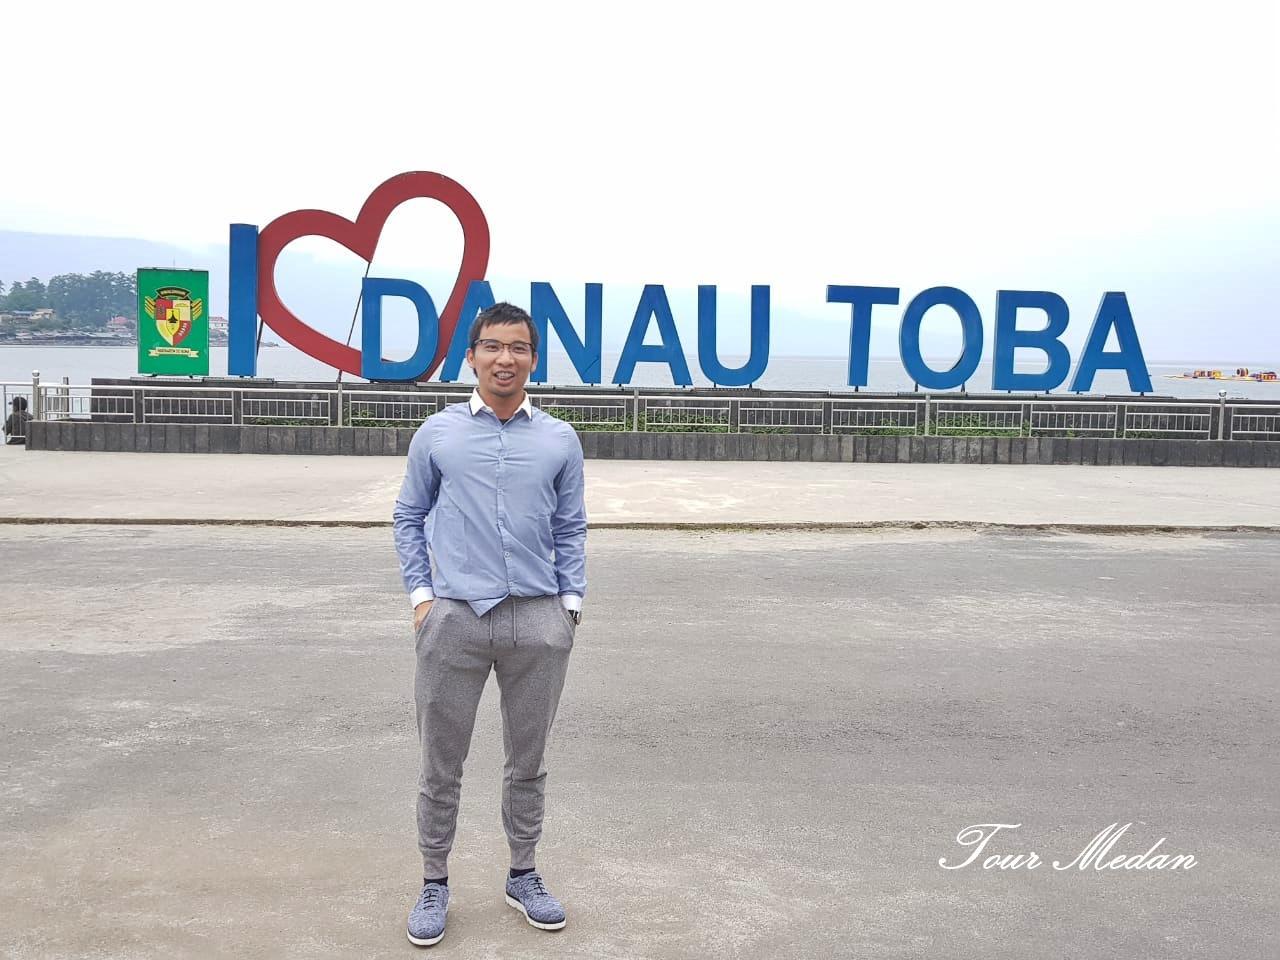 Foto Danau Toba - I Love Danau Toba